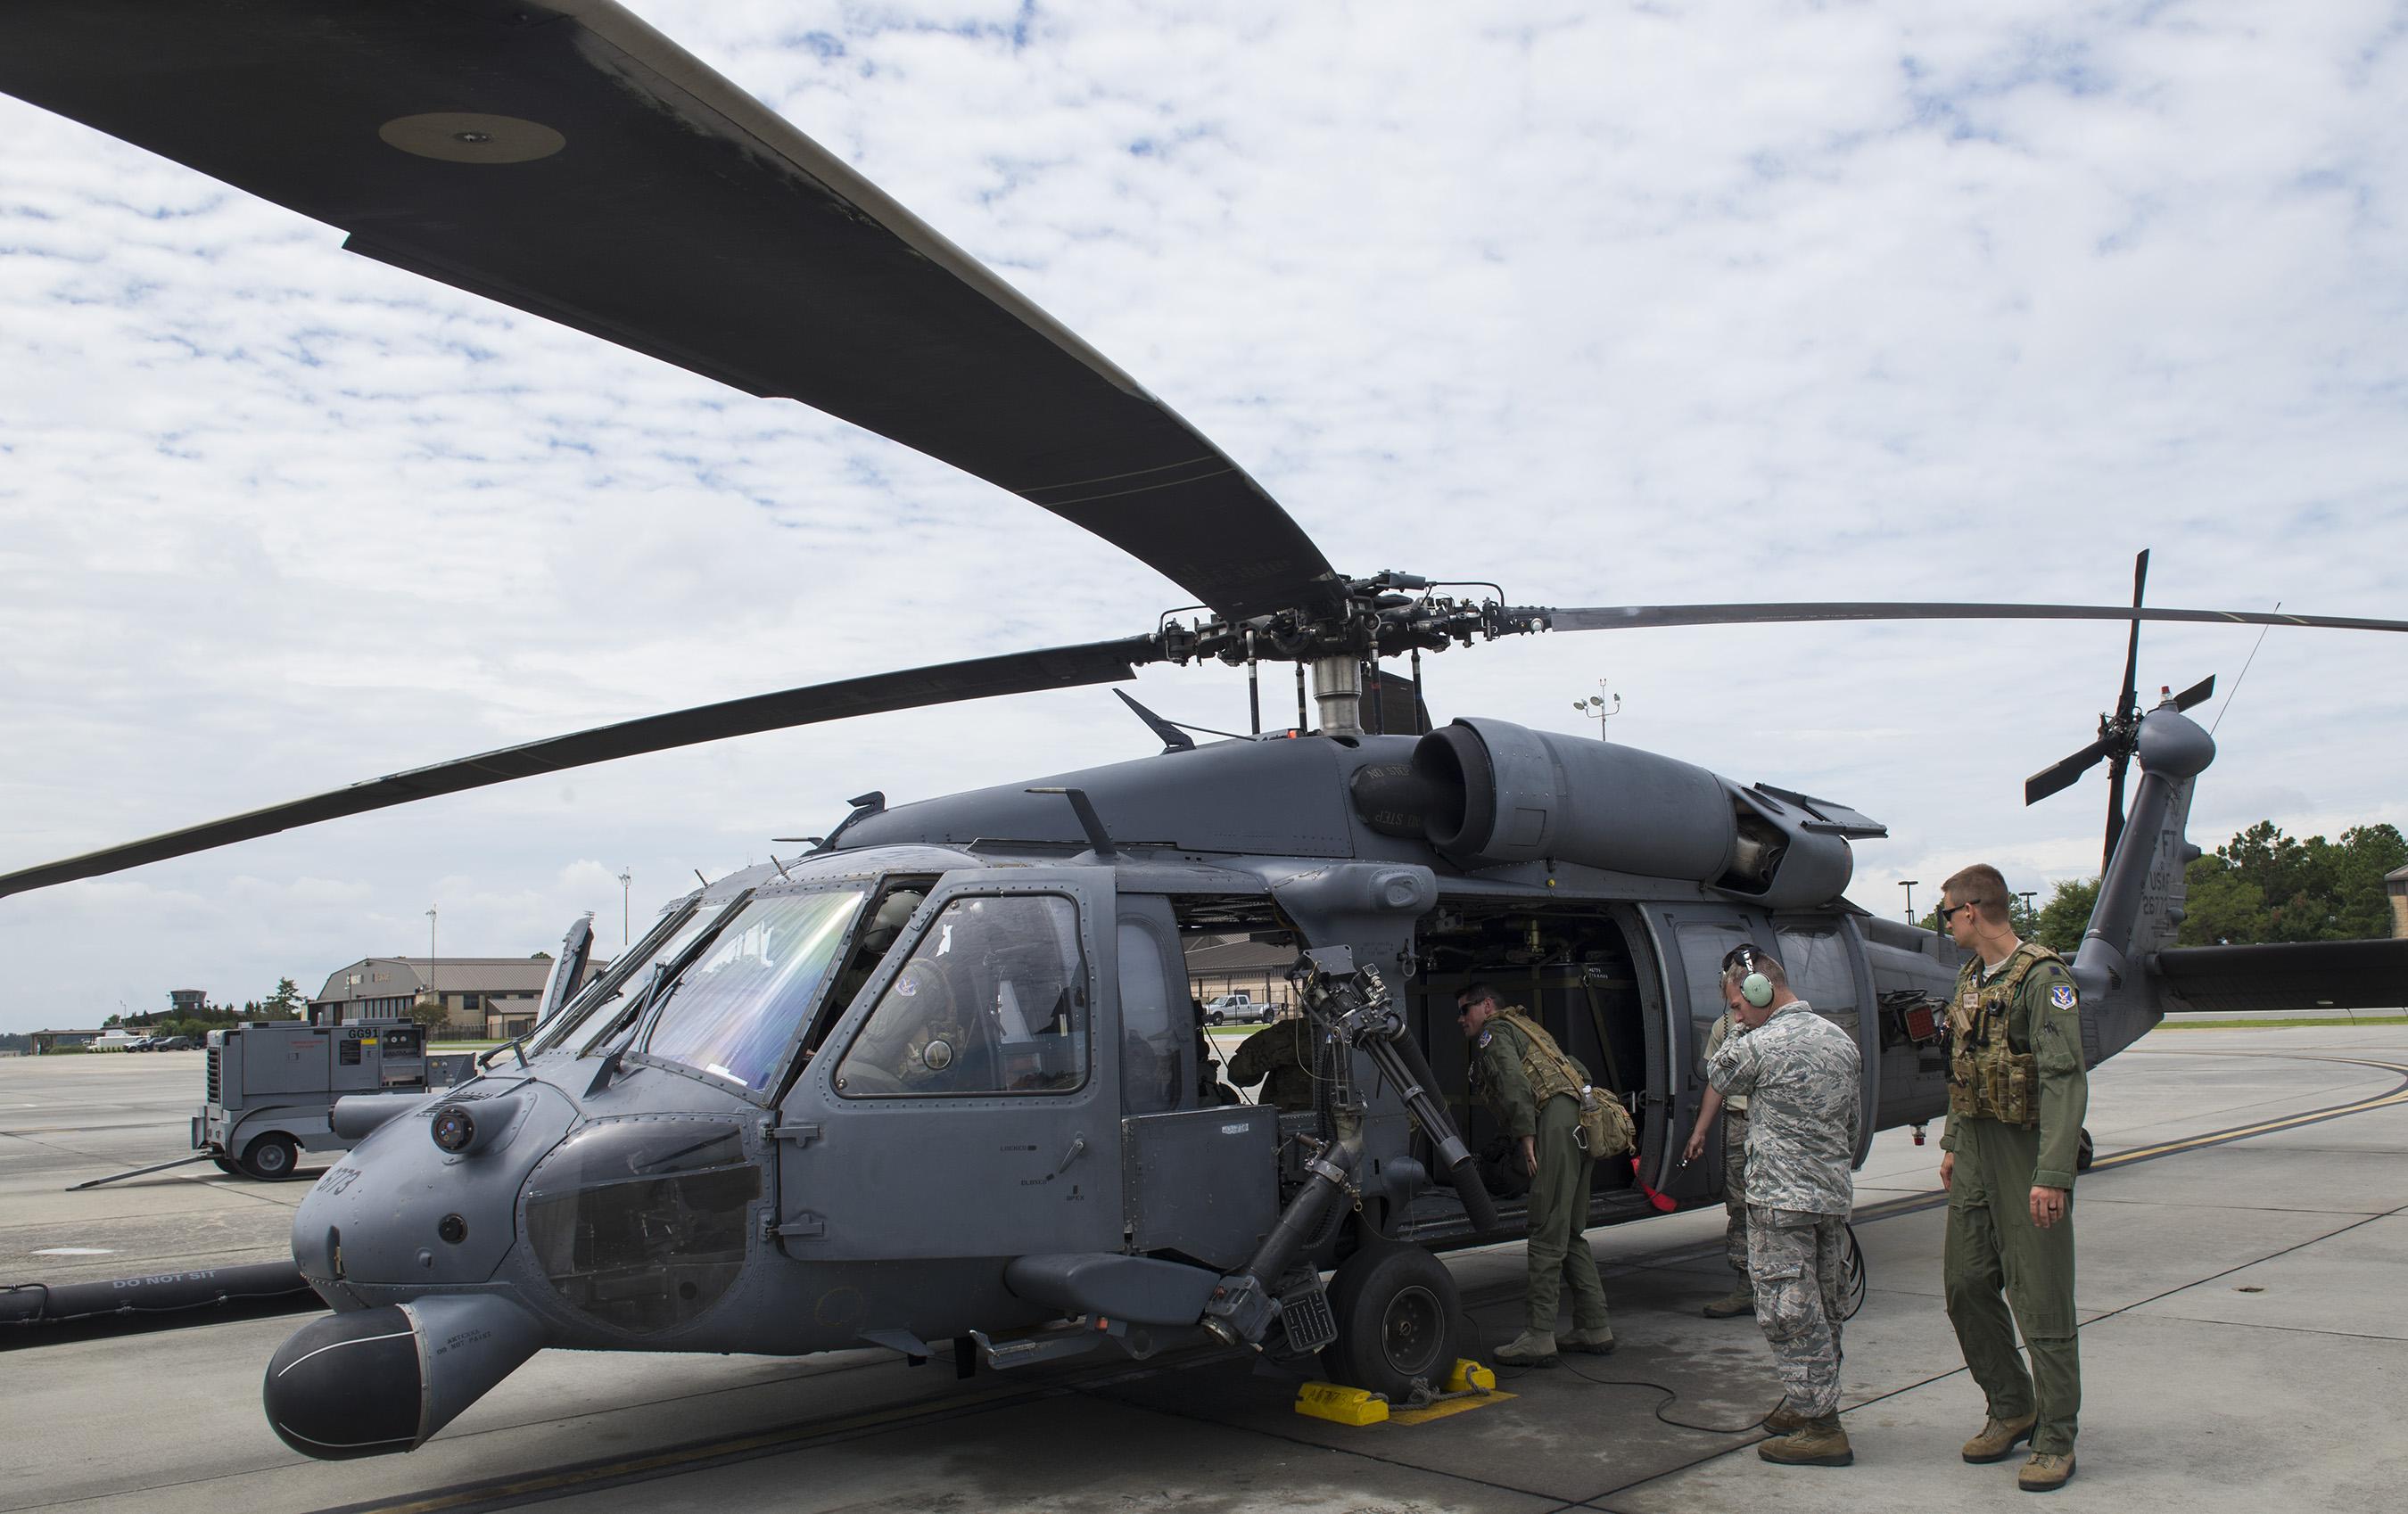 41st HMU keeps Pave Hawks airborne > Moody Air Force Base